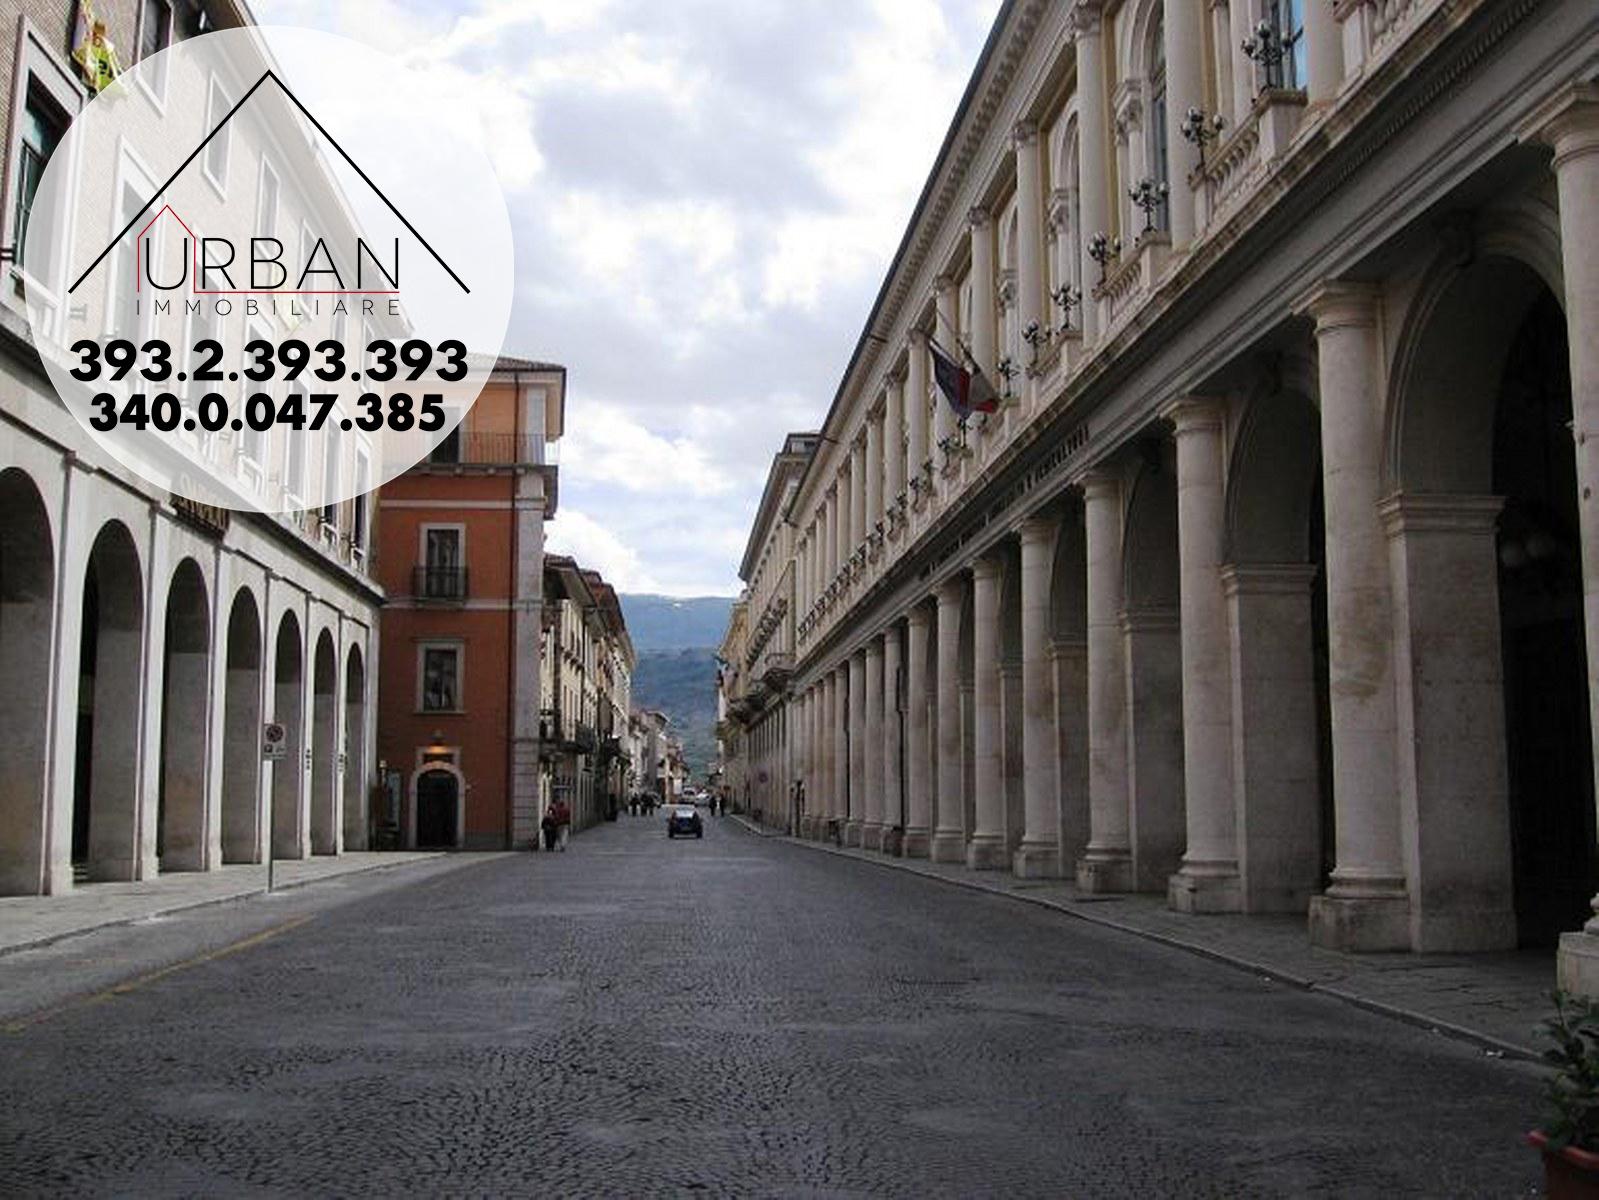 L'Aquila (AQ) - Corso Vittorio Emanuele